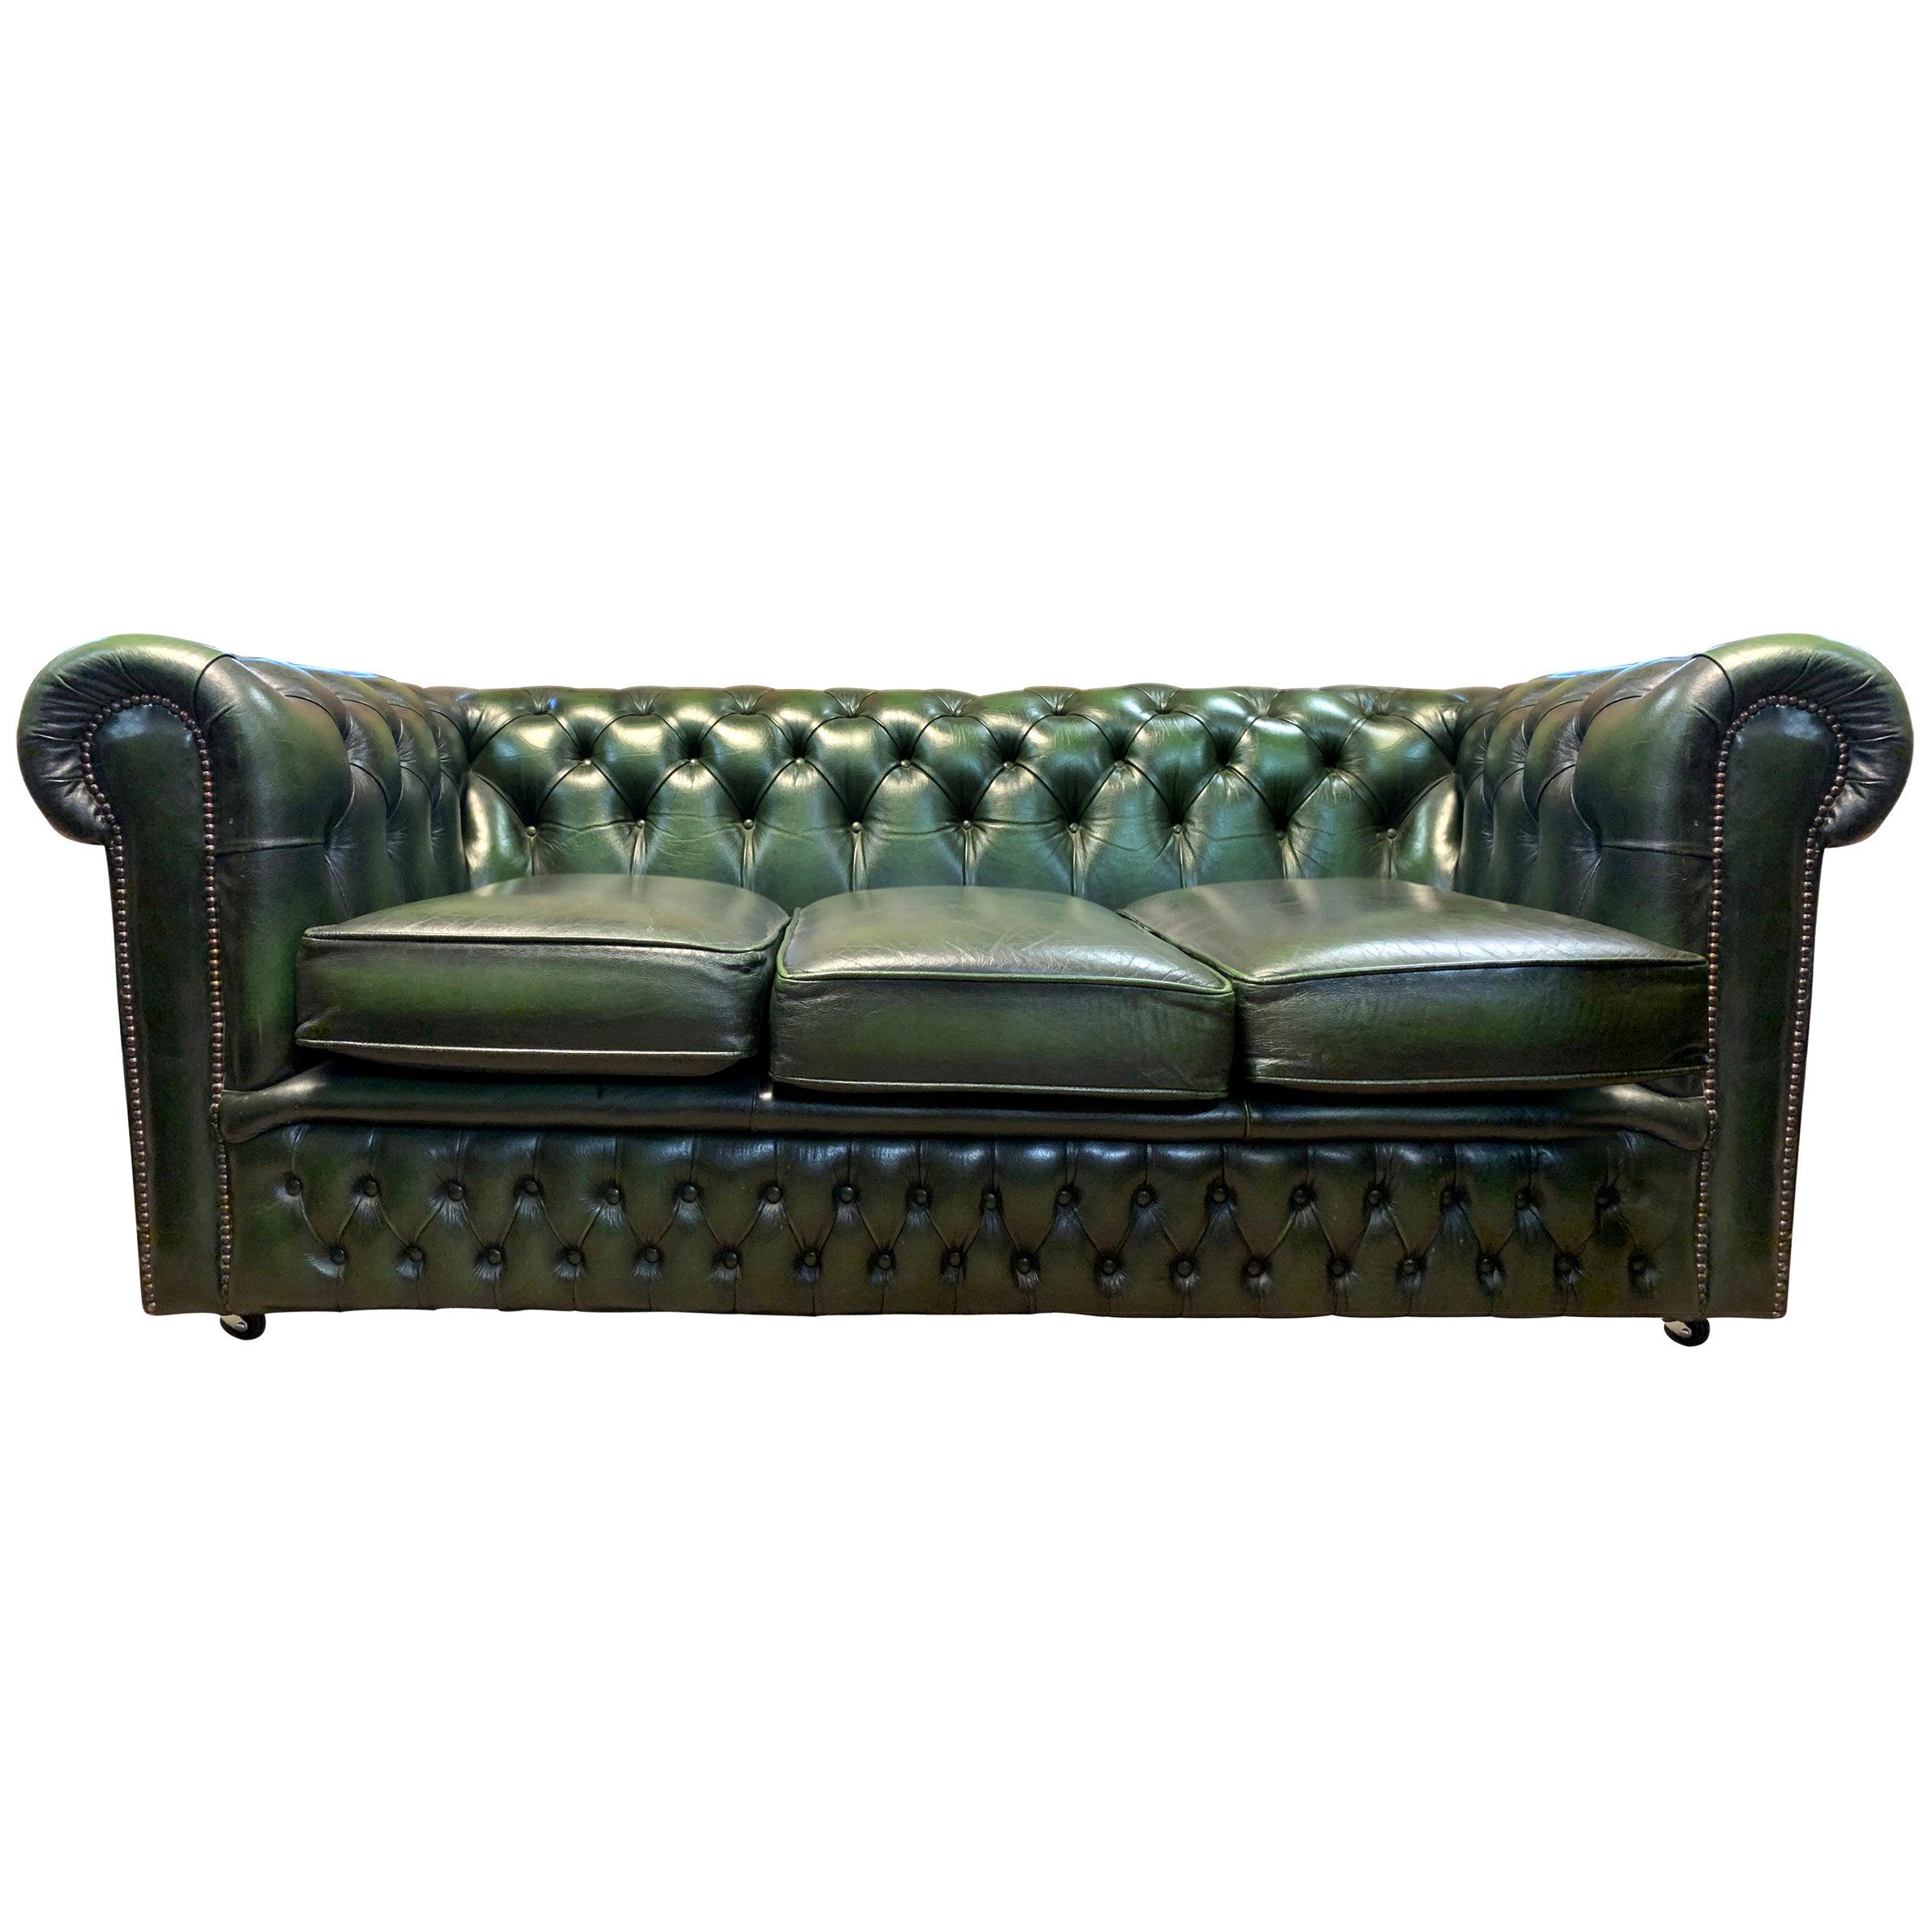 Midcentury English Emerald Green Chesterfield Sofa